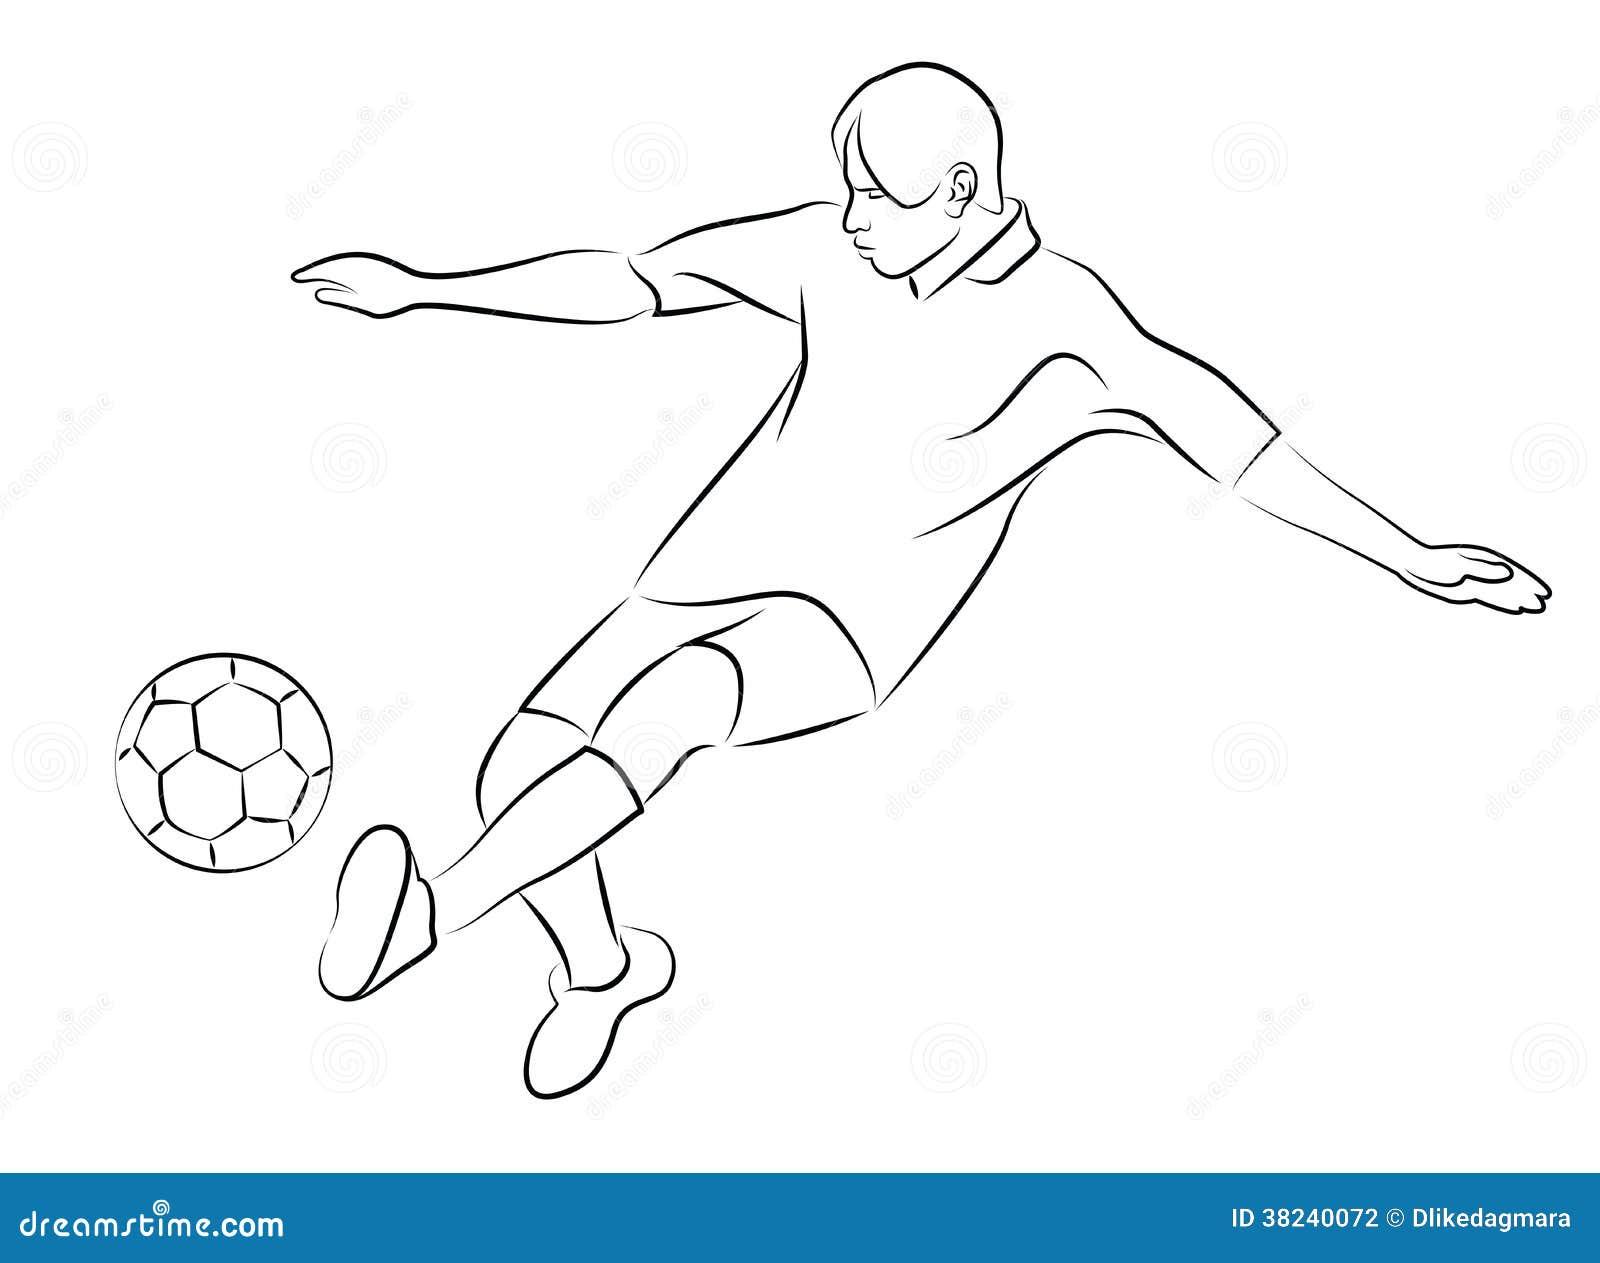 Football Player Stock Illustration. Illustration Of Sport - 38240072